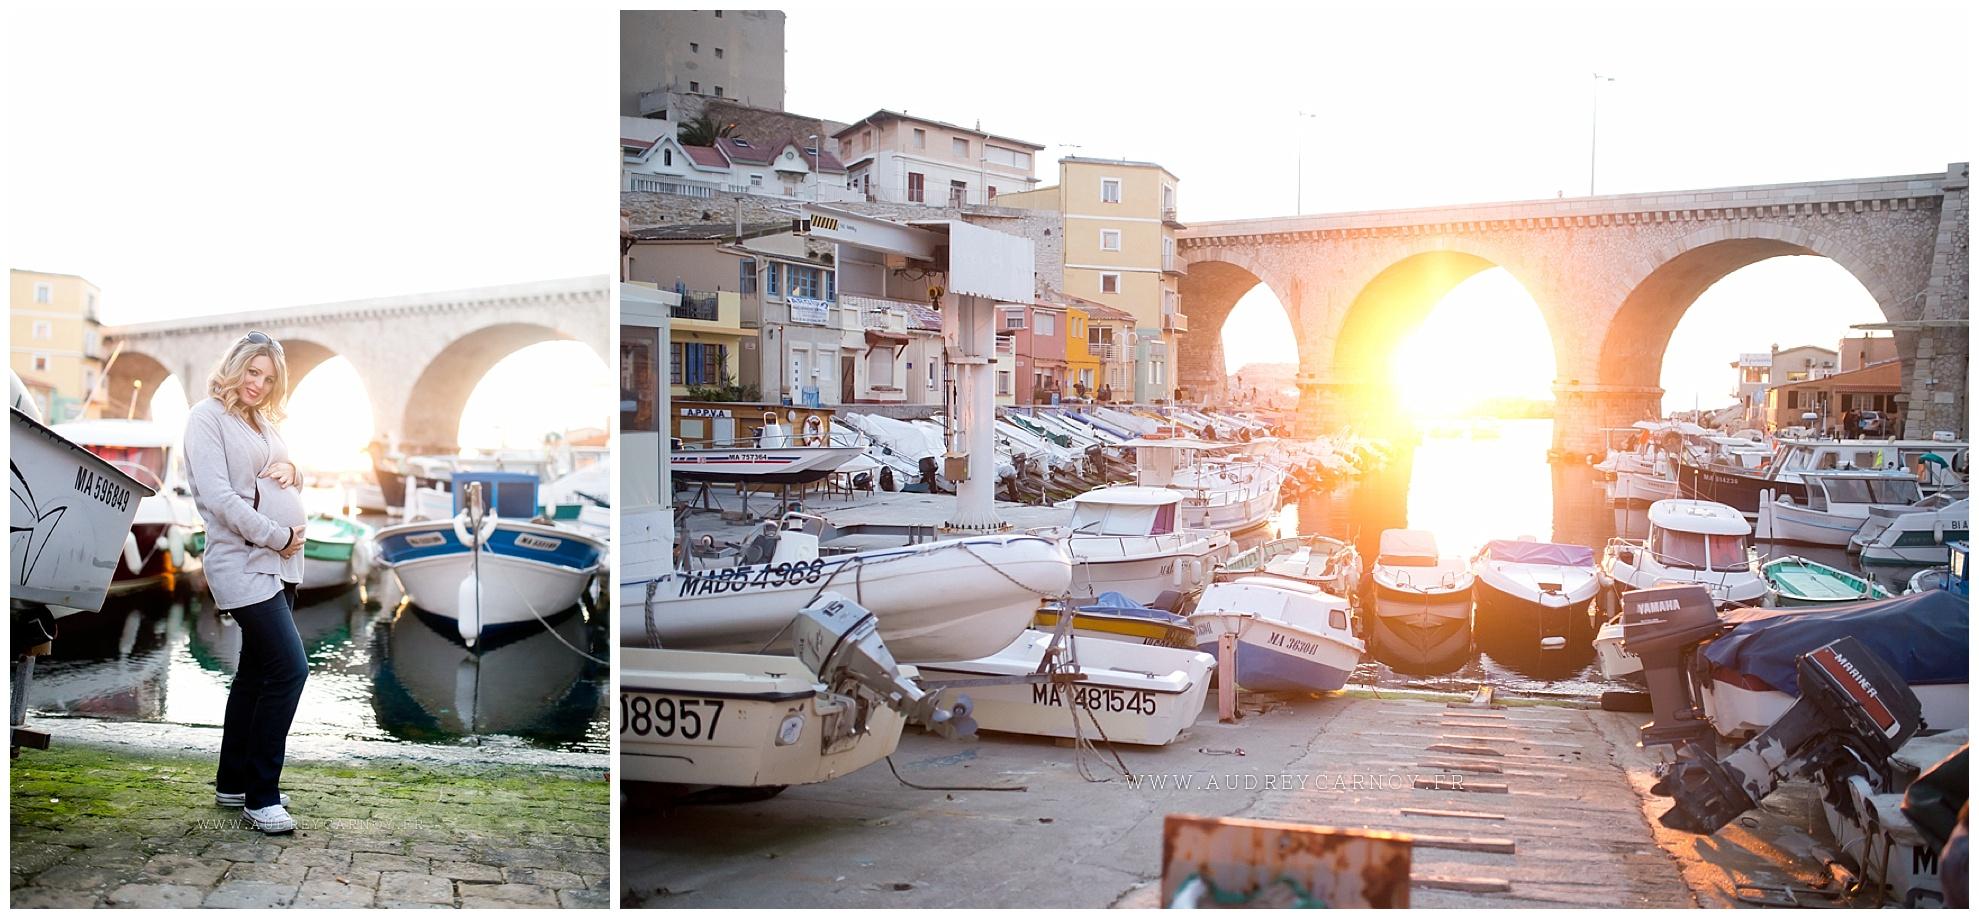 Séance grossesse - Marseille | Marine 36